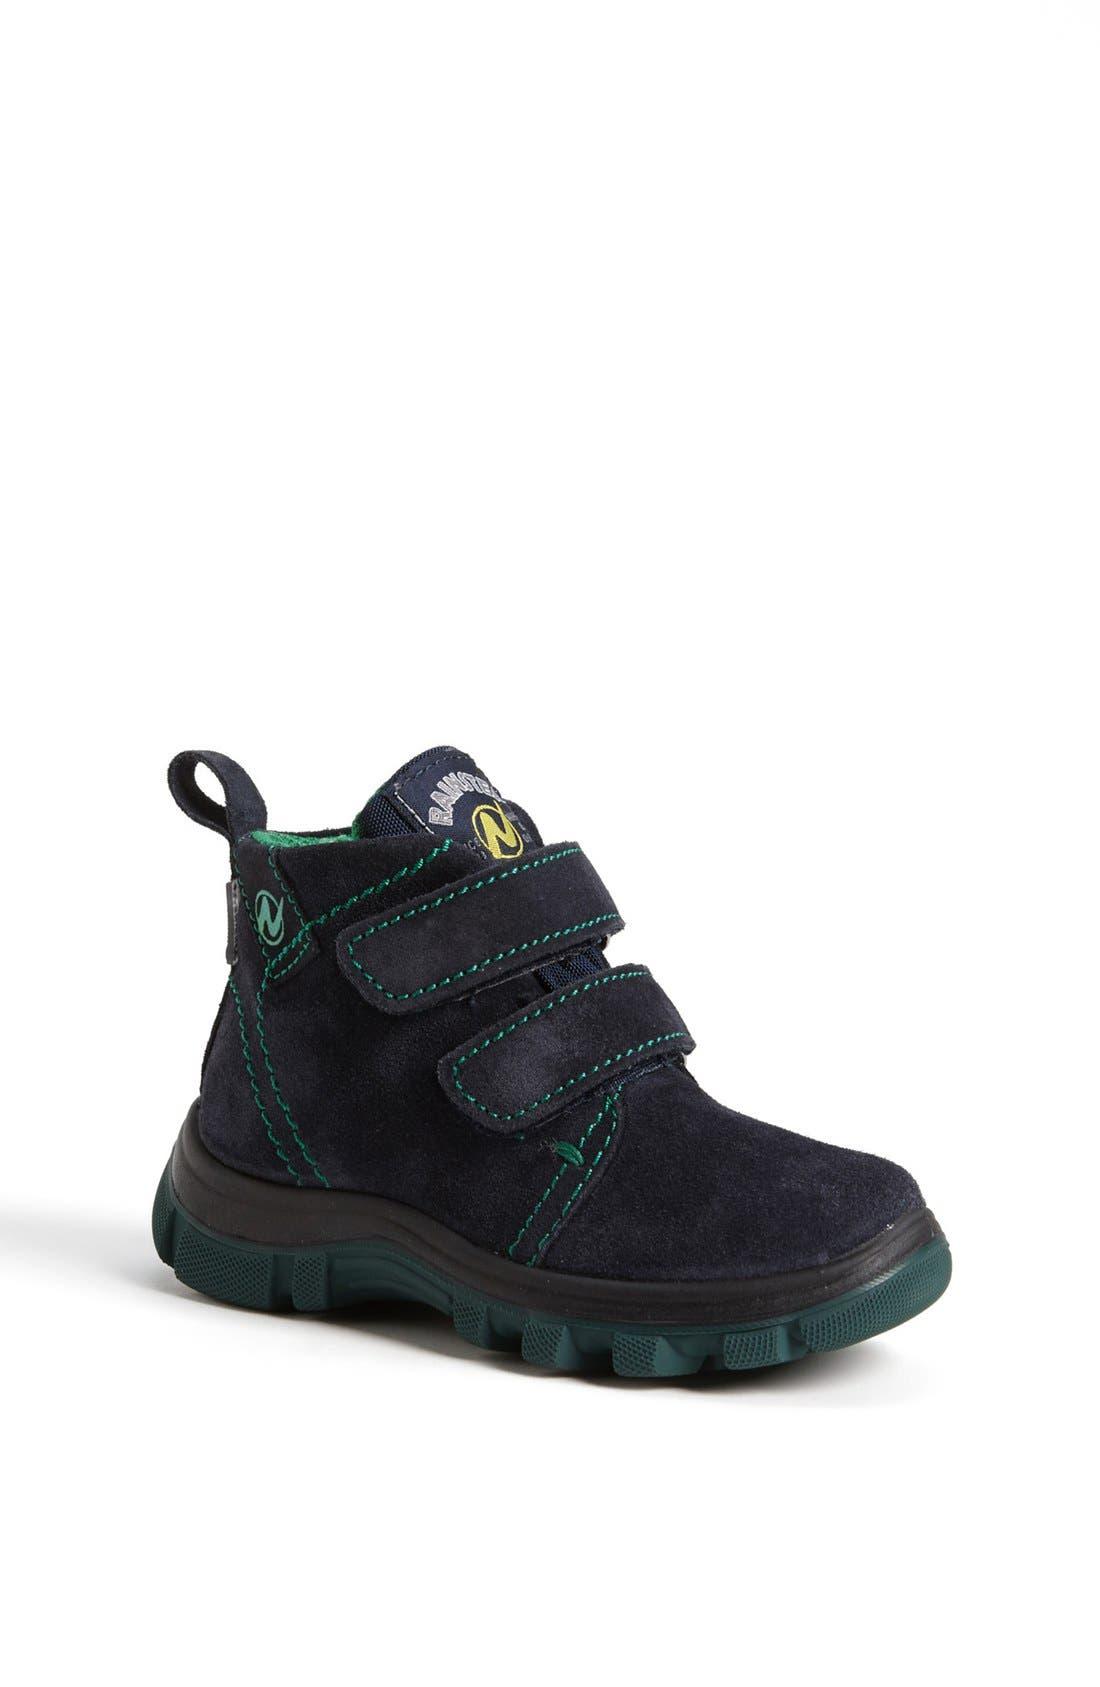 Main Image - Naturino 'Bakutis Rainstep' Waterproof Boot (Walker, Toddler & Little Kid)